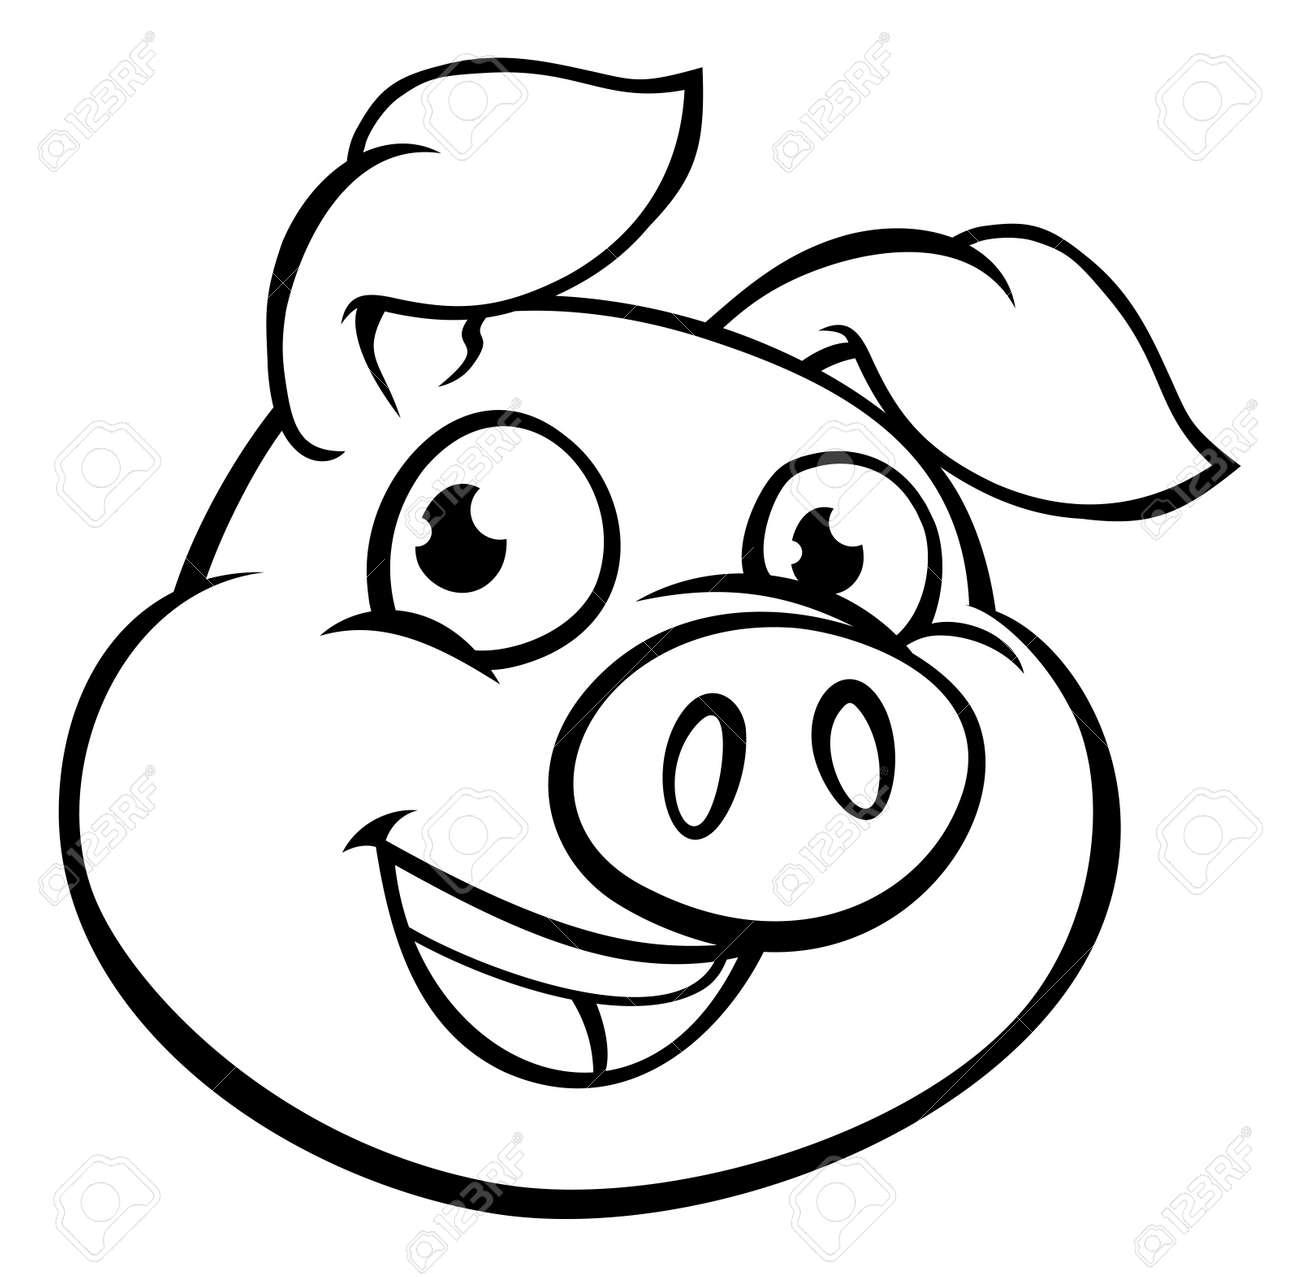 Cartoon Pig Mascot Character - 89934098